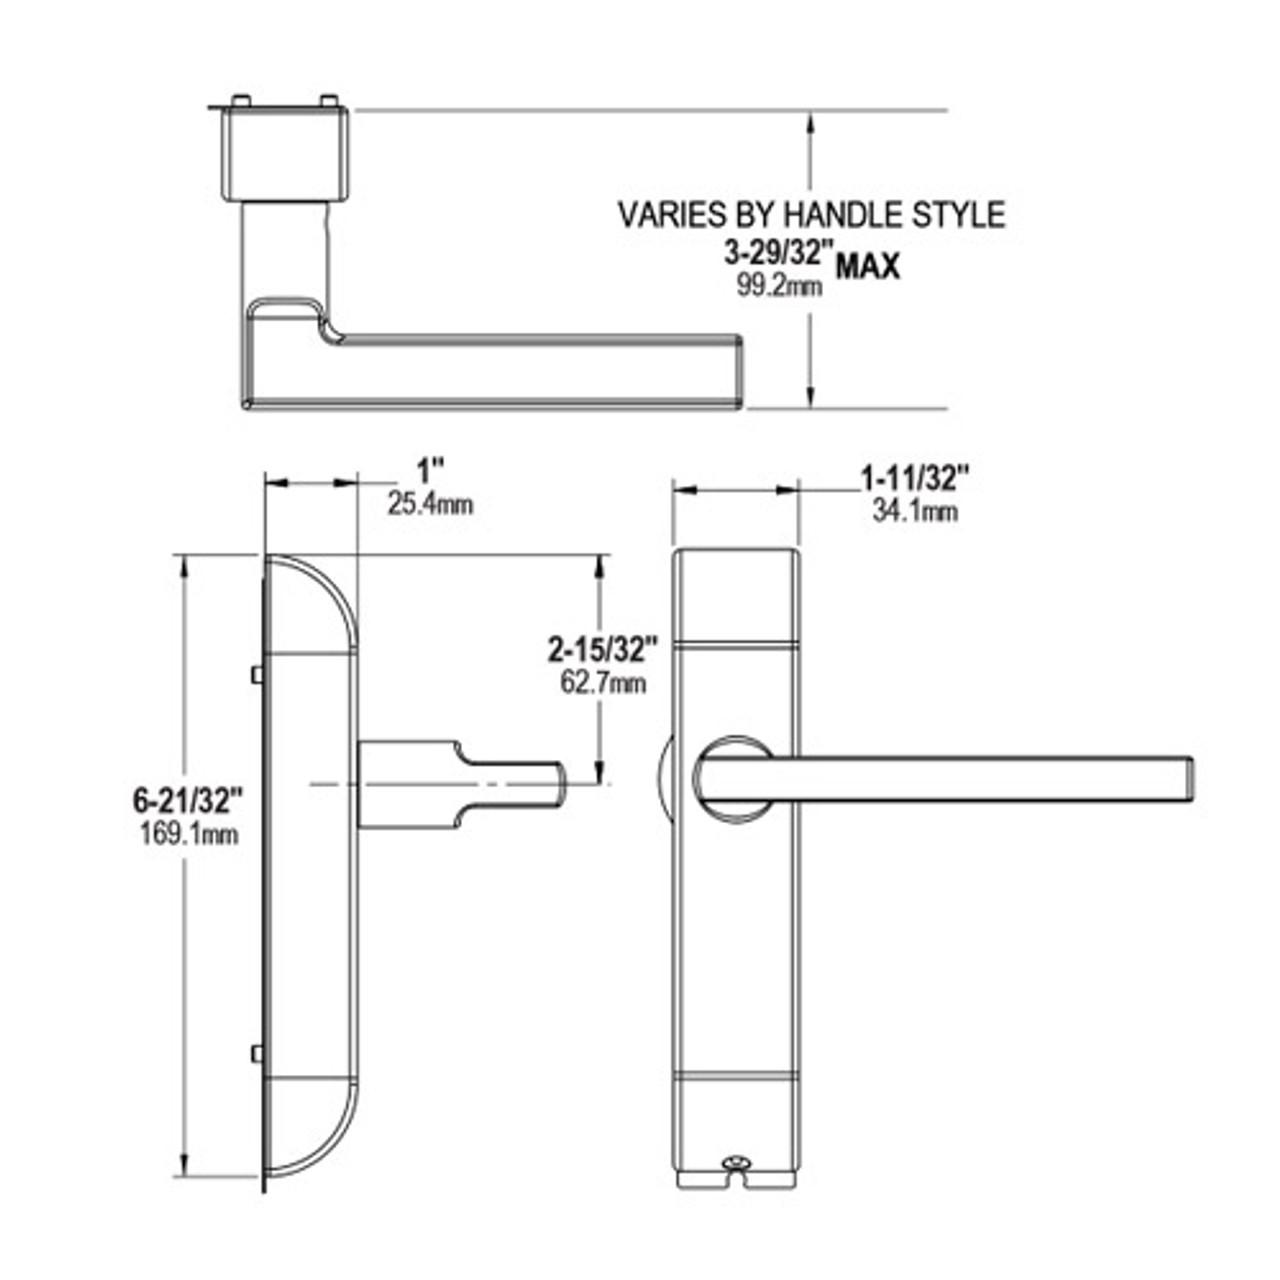 4600-MD-651-US3 Adams Rite MD Designer handle Dimensional View